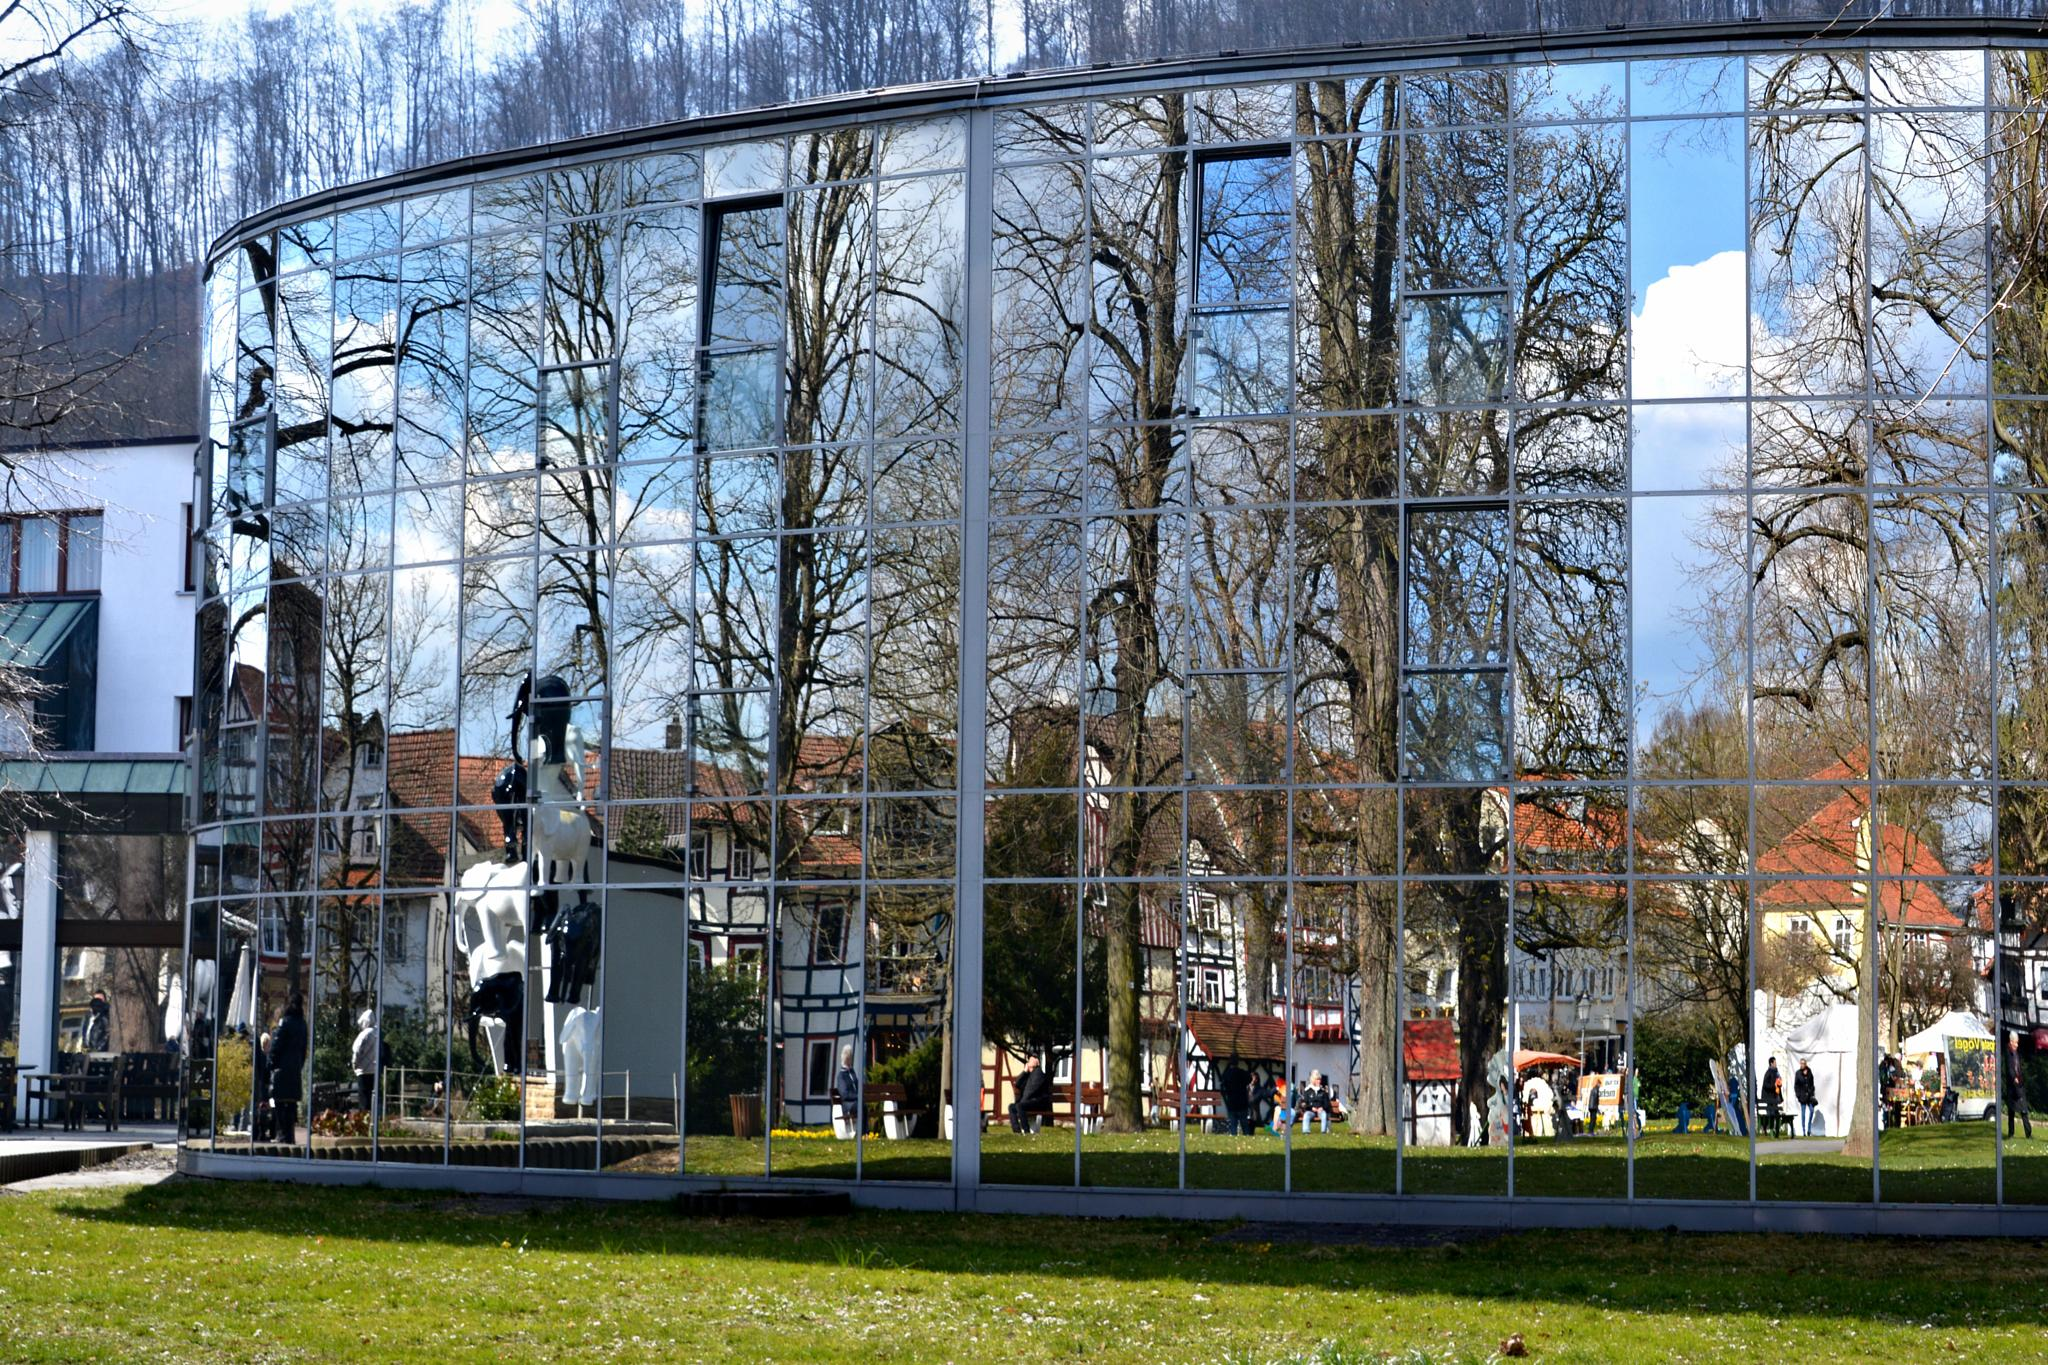 Spiegelfassade vom Kurlturforum in Bad Sooden-Allendorf by RoPaFue